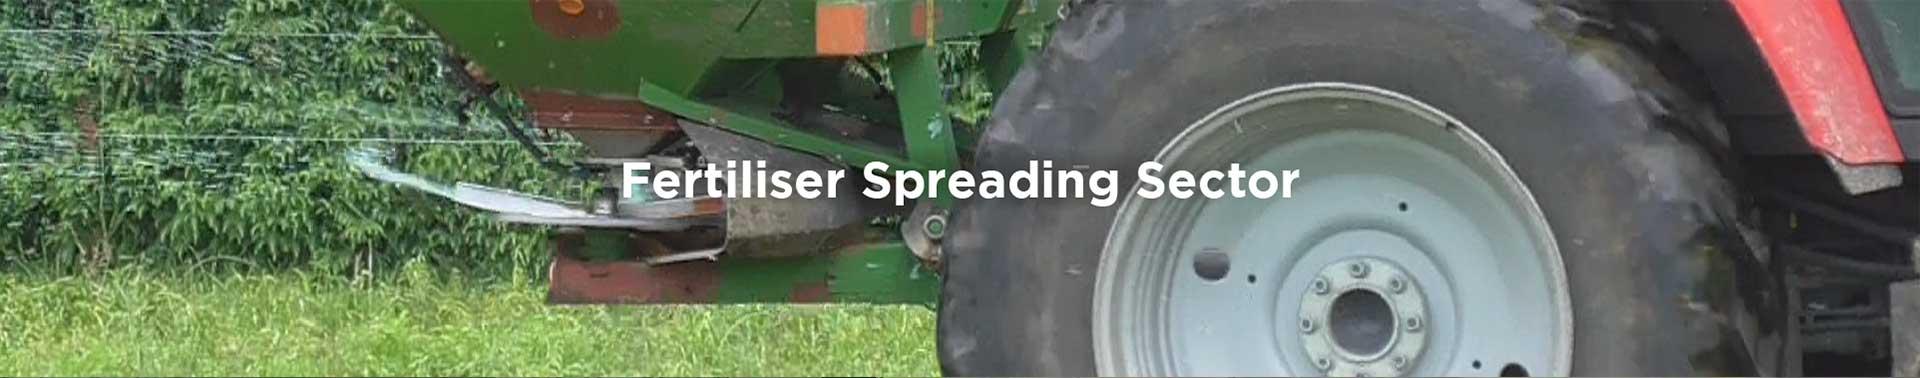 qconz-hero-image-fertiliser-spreading